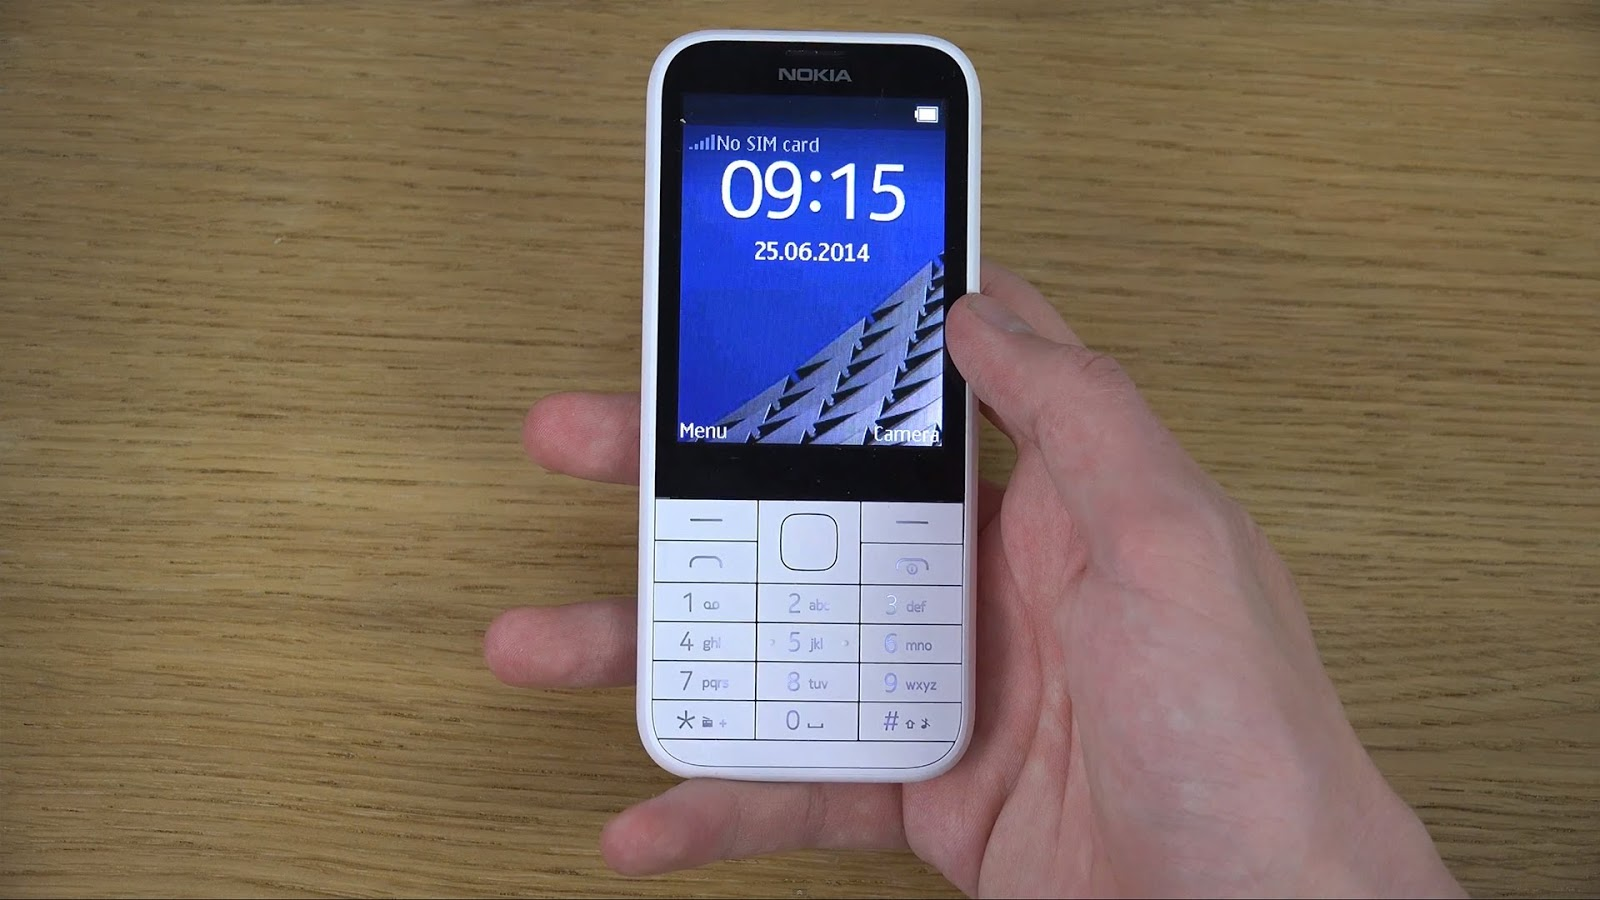 Madison : Nokia 3310 3g whatsapp download